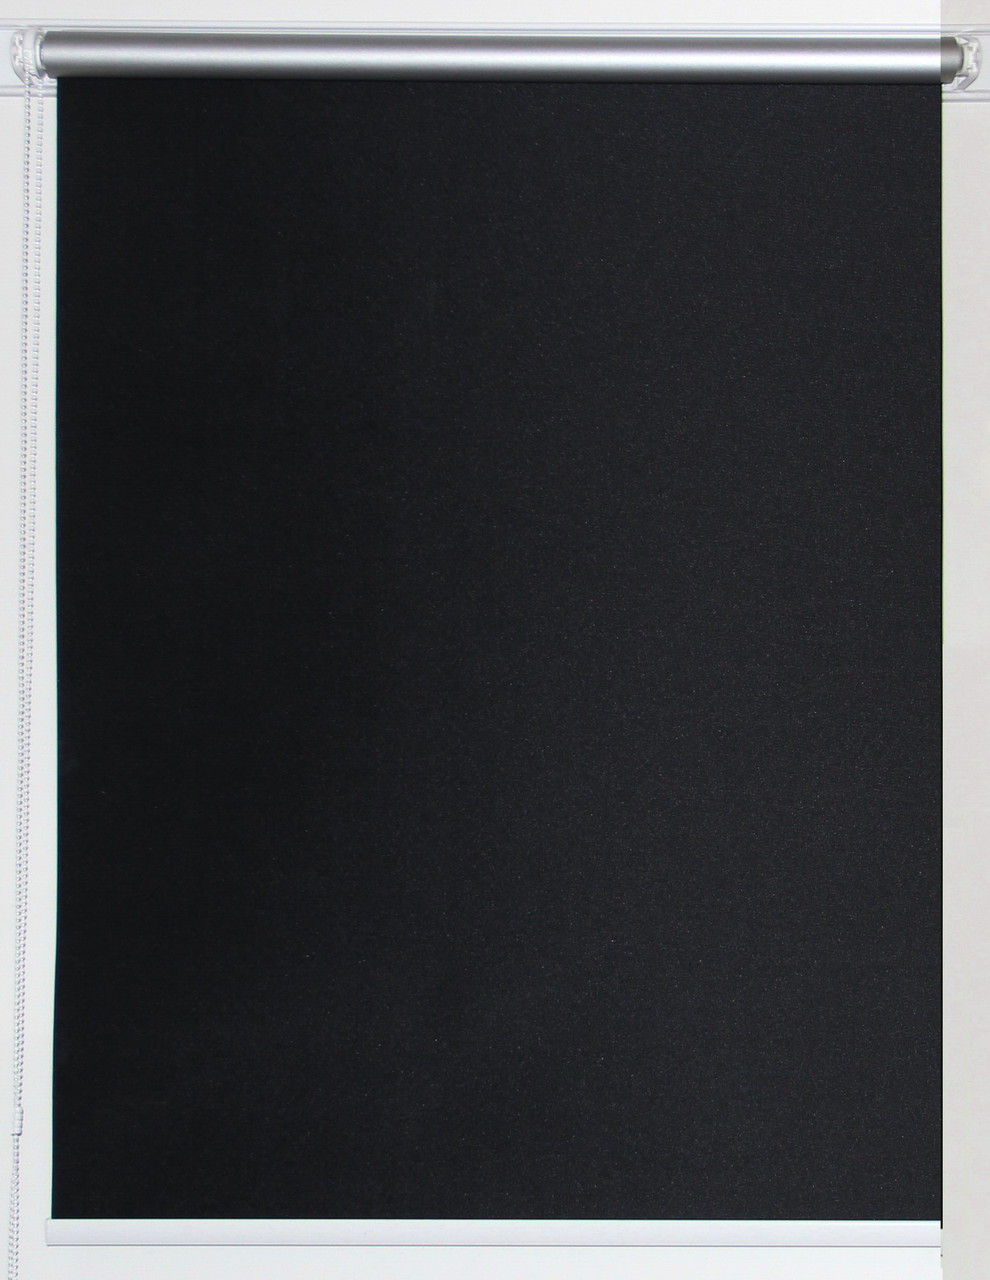 Рулонная штора 550*1500 Блэкаут Сильвер Чёрный